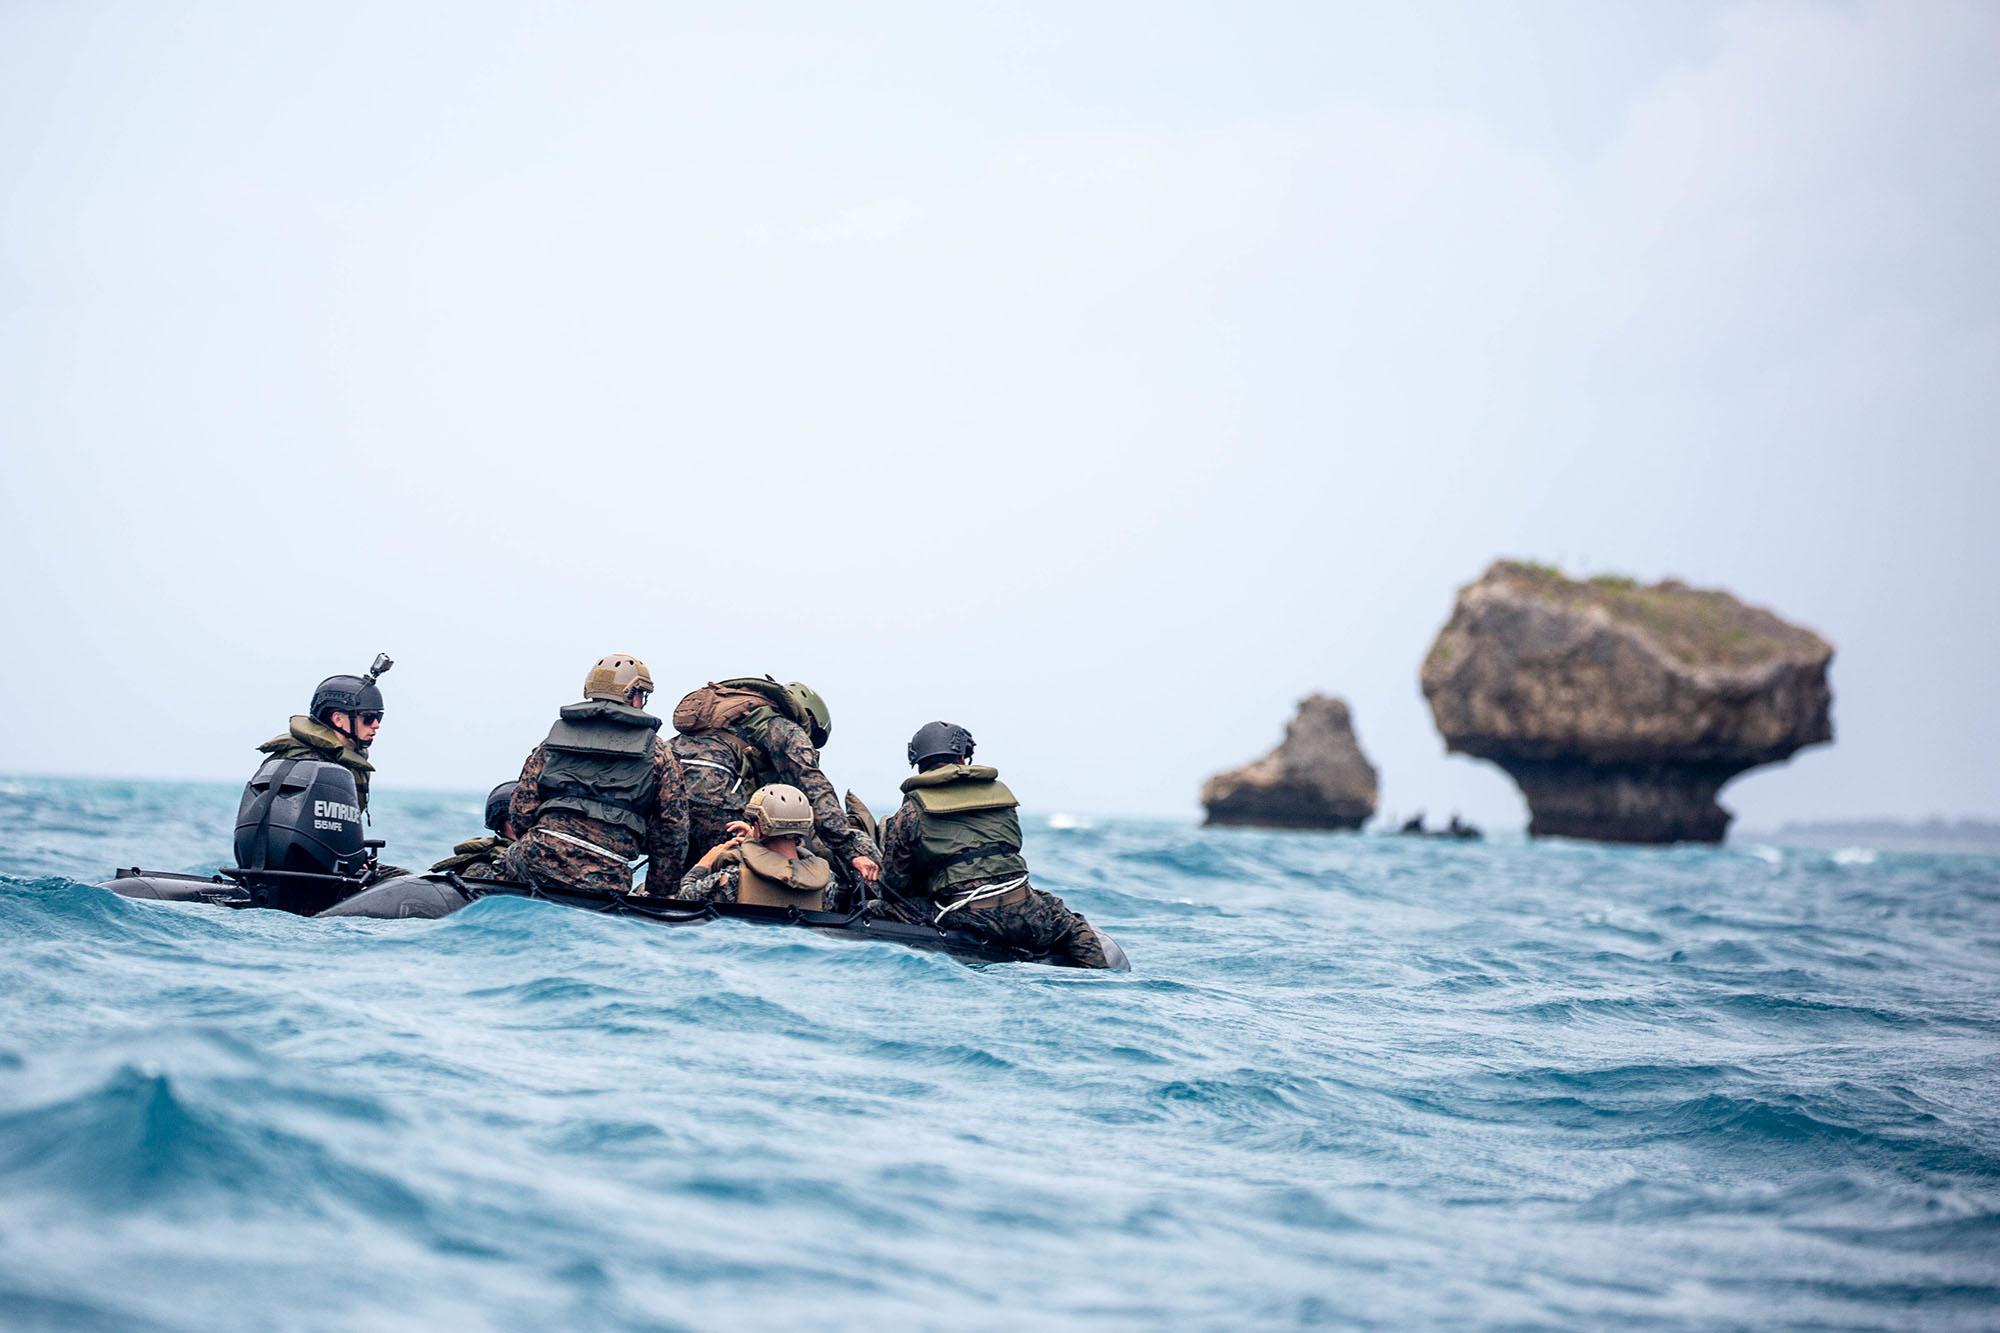 Marines navigate combat rubber raiding craft during small boat tactics training at White Beach Naval Facility in Okinawa, Japan, May 27, 2021. (Sgt. Cody Rowe/Marine Corps)